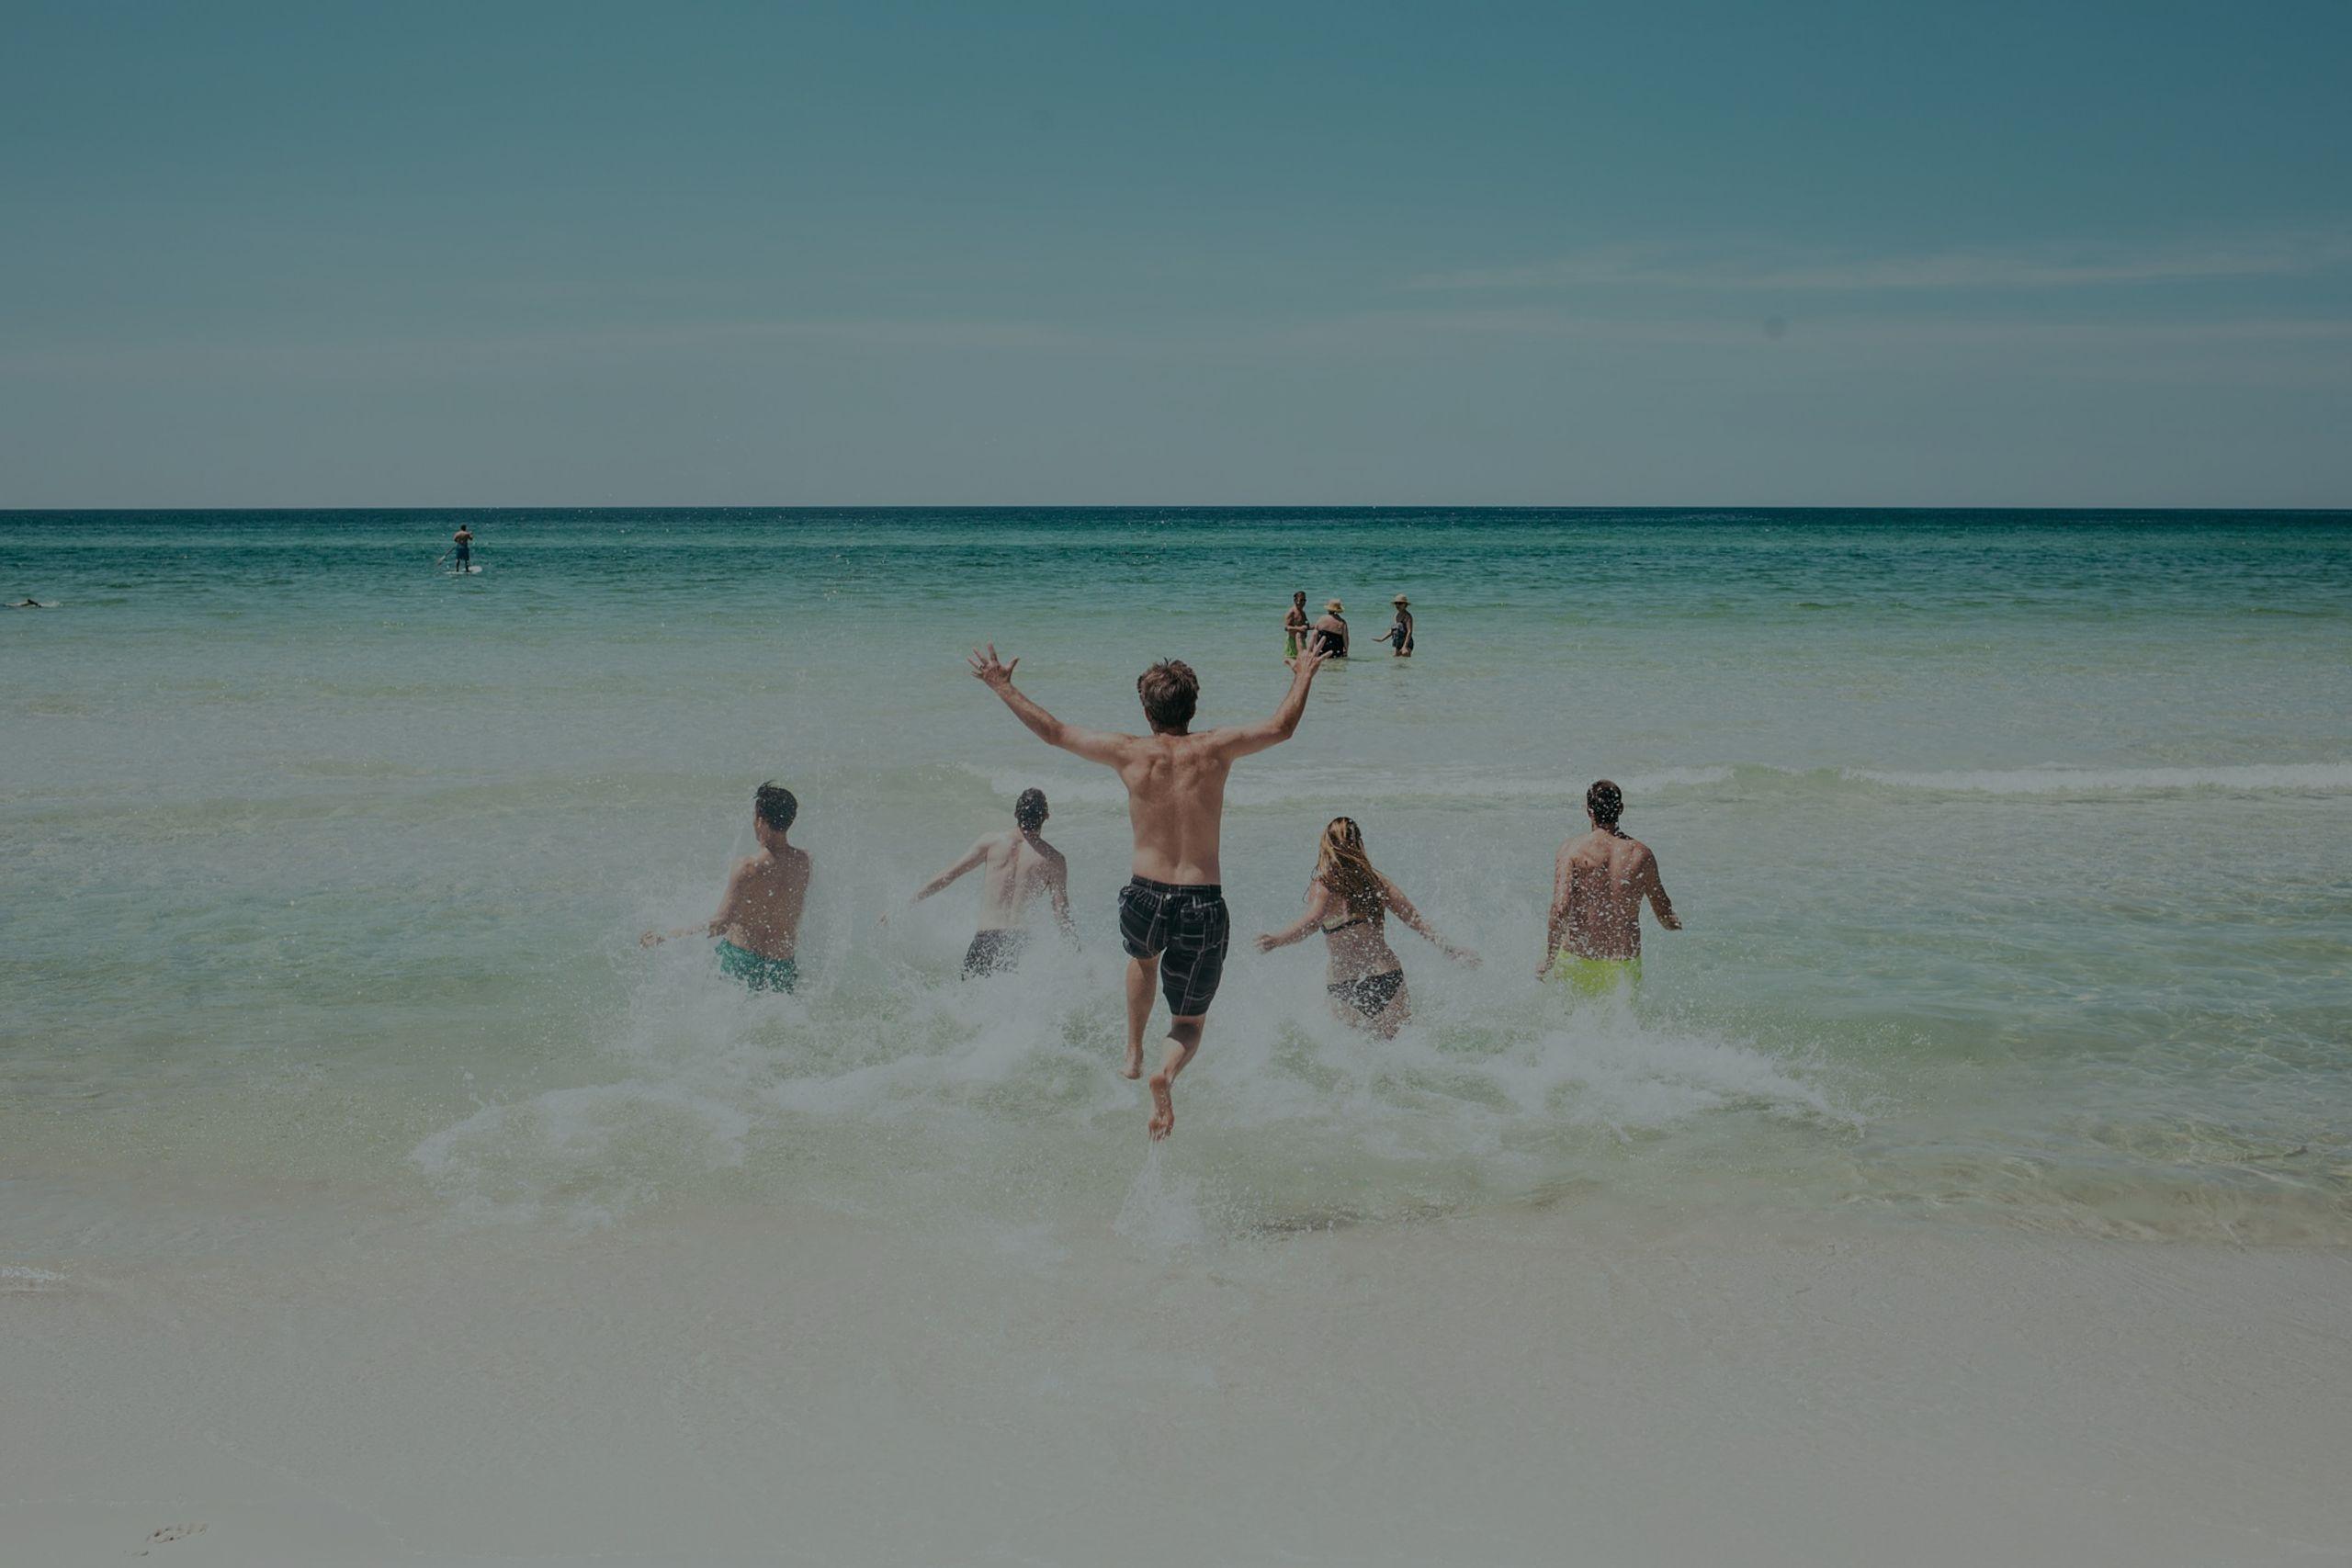 Sun and Fun in Daytona Beach – How To Prevent and Treat Sunburn